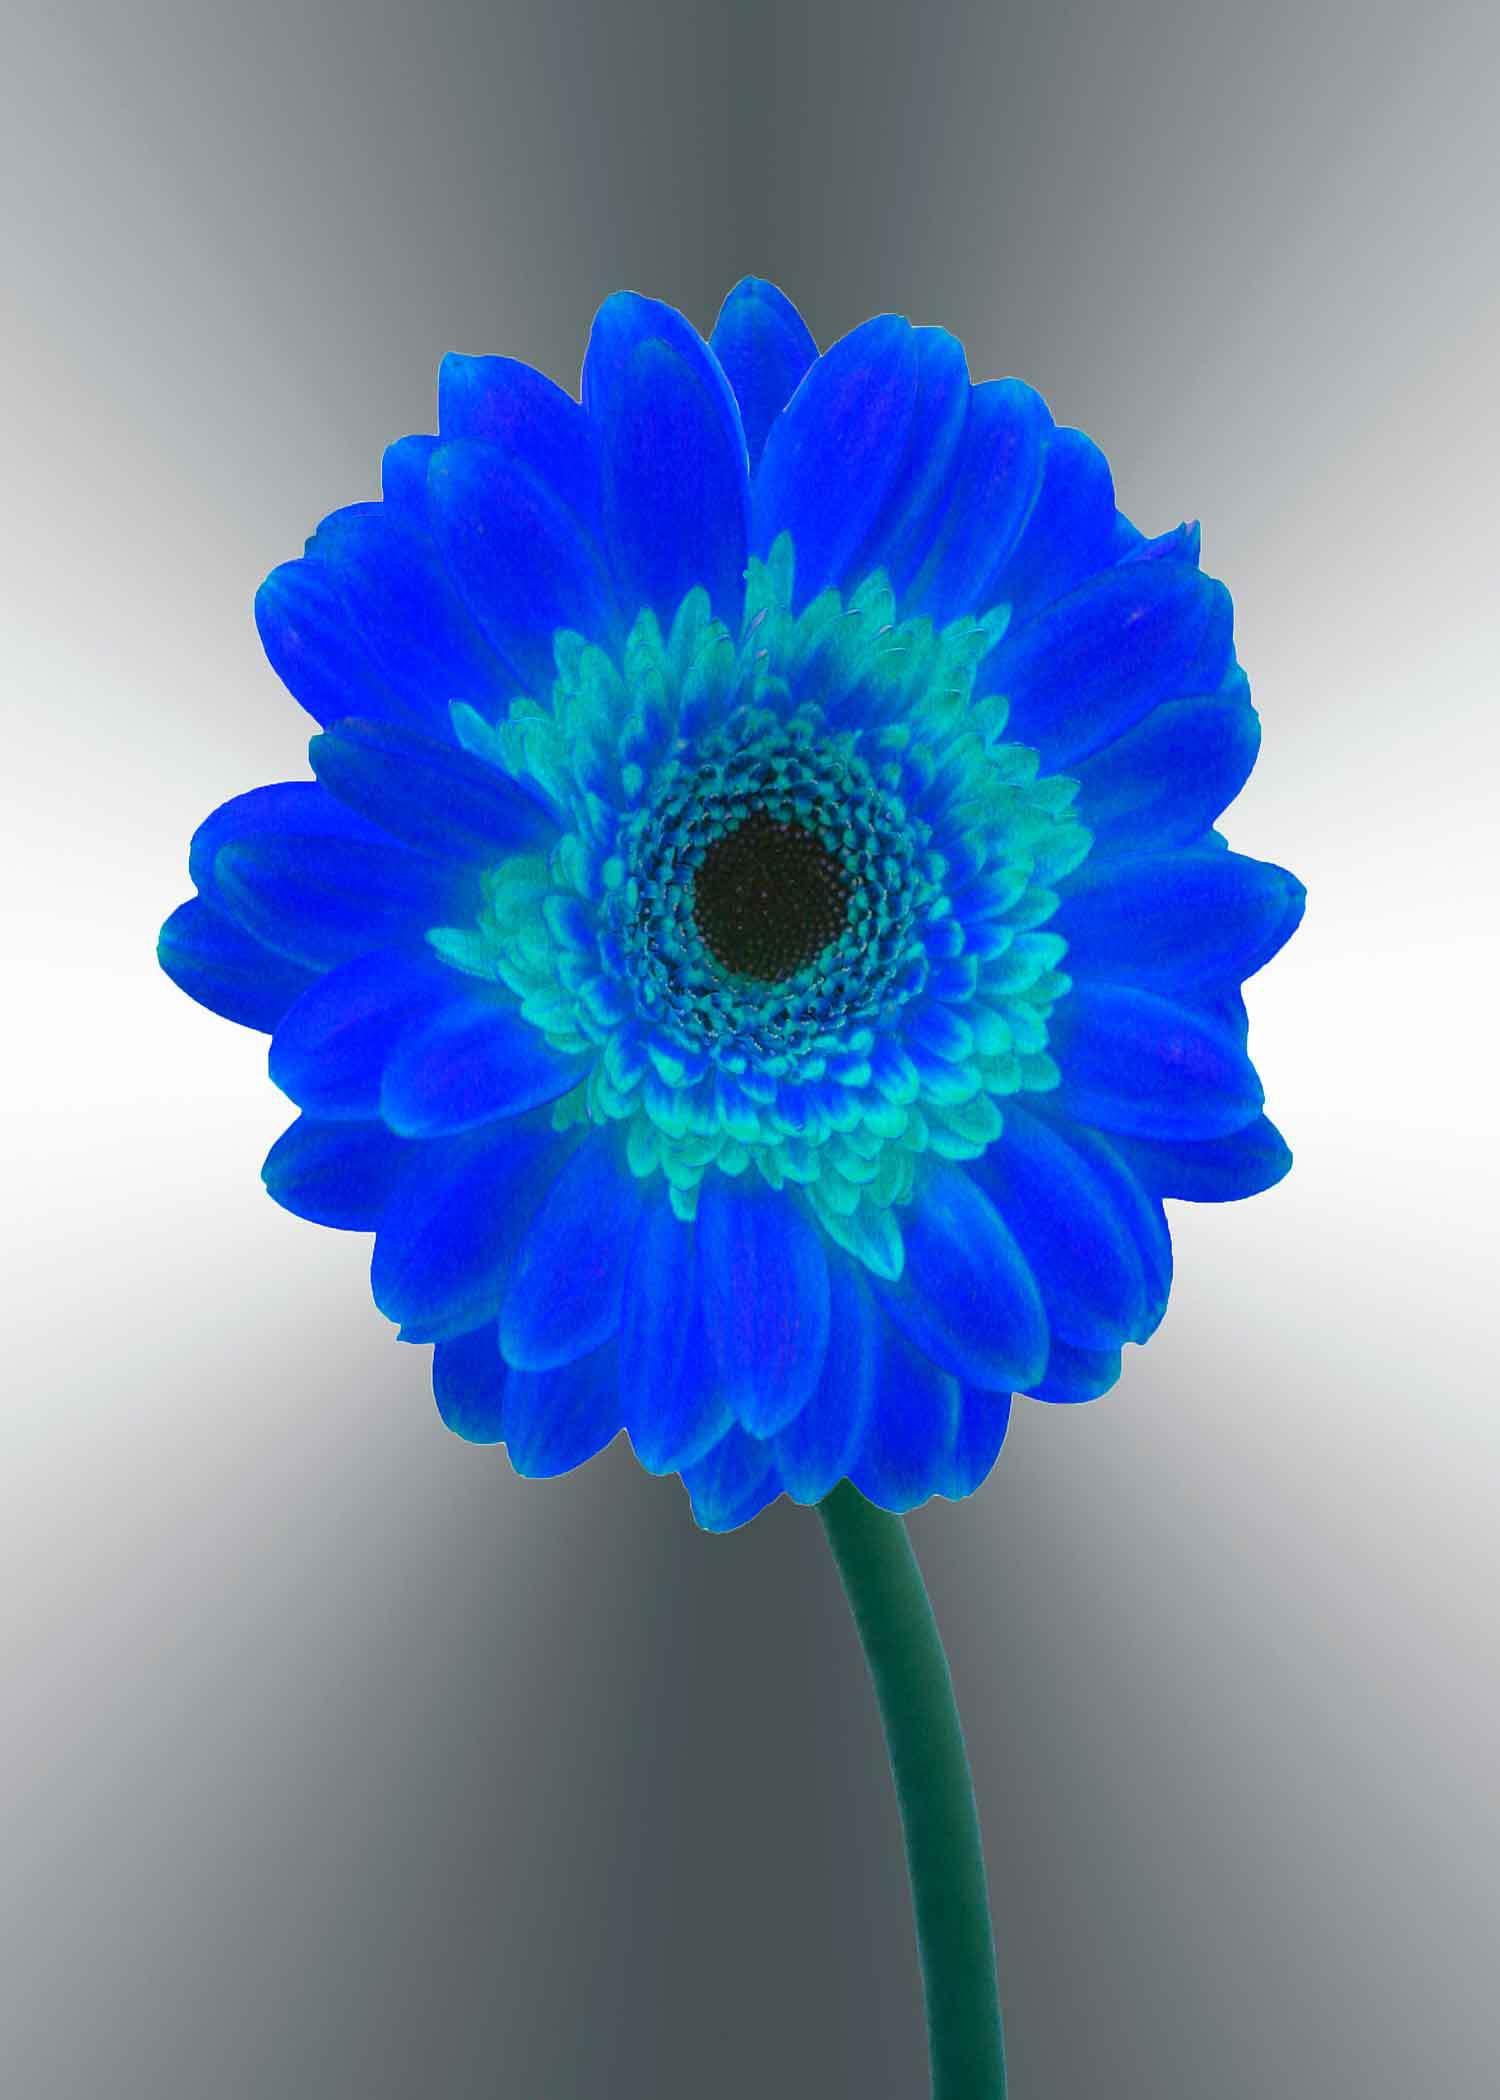 blue-gerger-daisy-5x7-(22-of-236)-Edit-2-copy-2.jpg